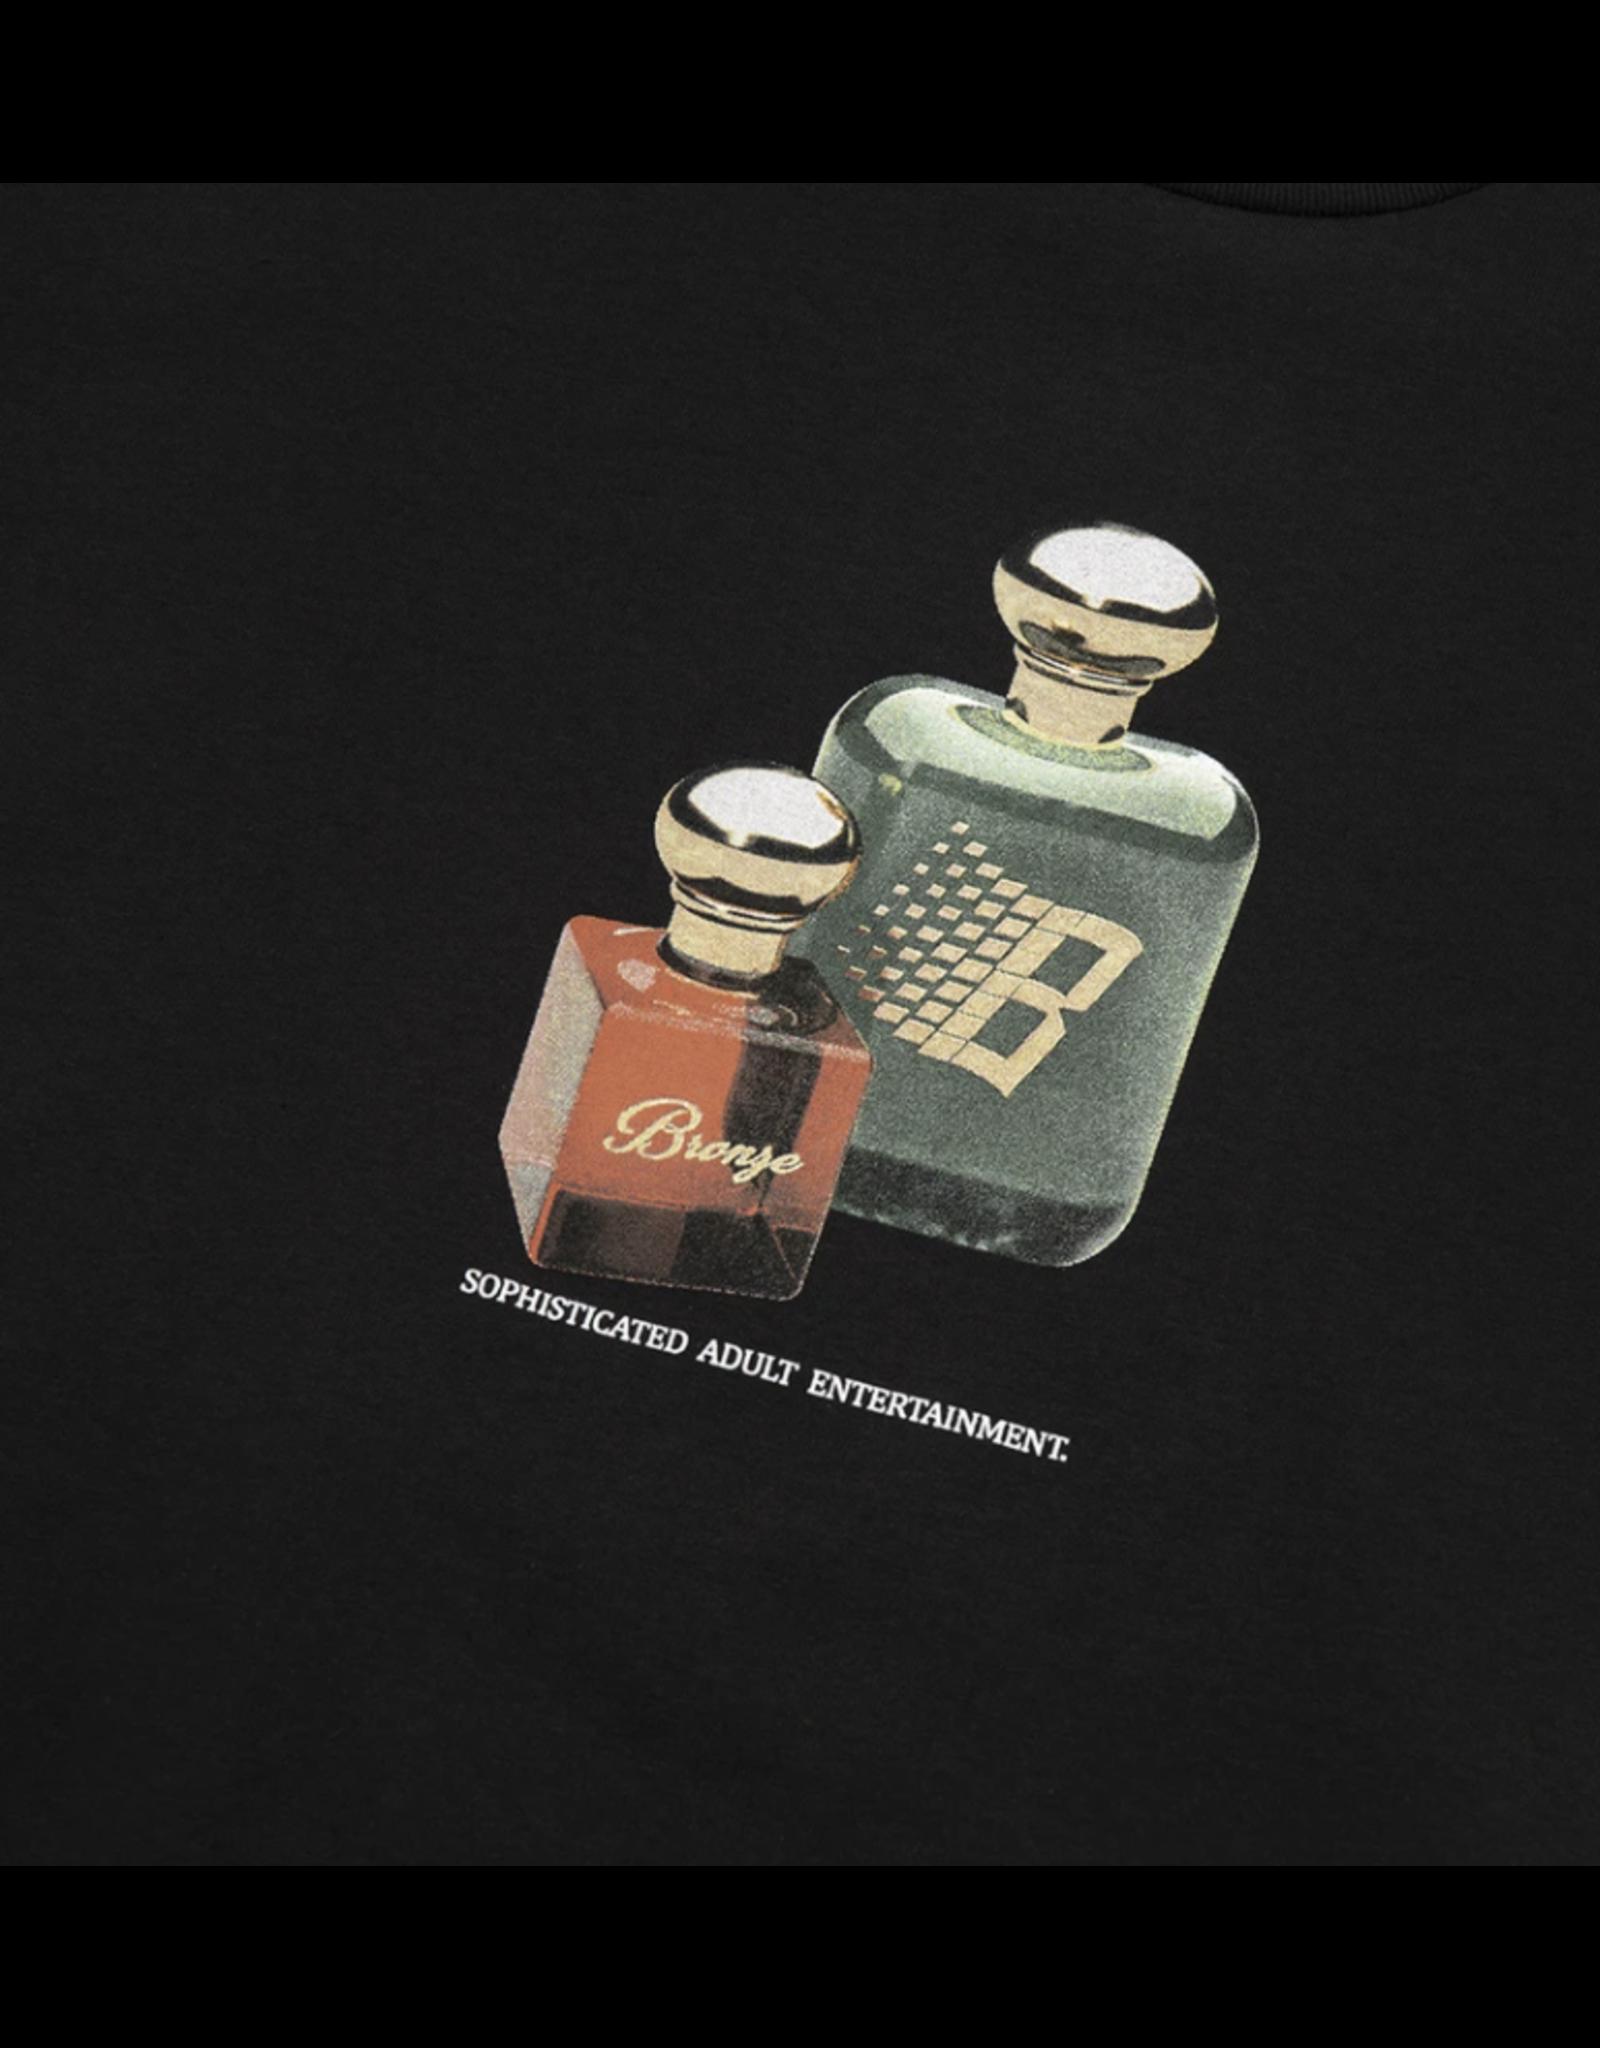 Bronze56K Fragrance Tee - Black